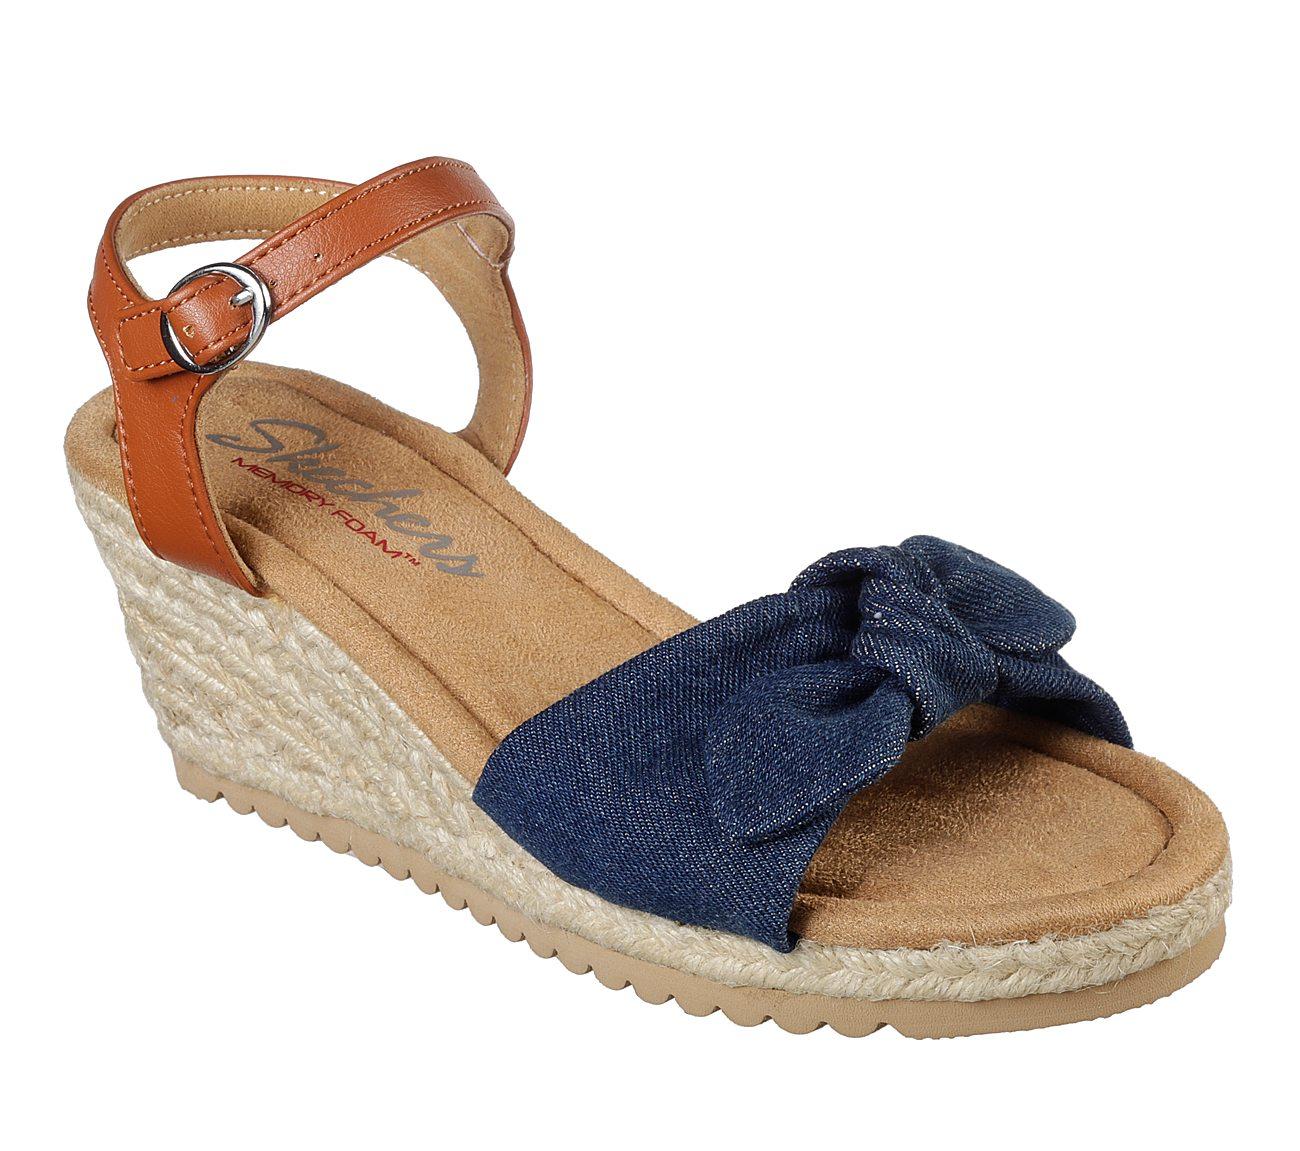 Daisy Dukes Slide Sandals Shoes